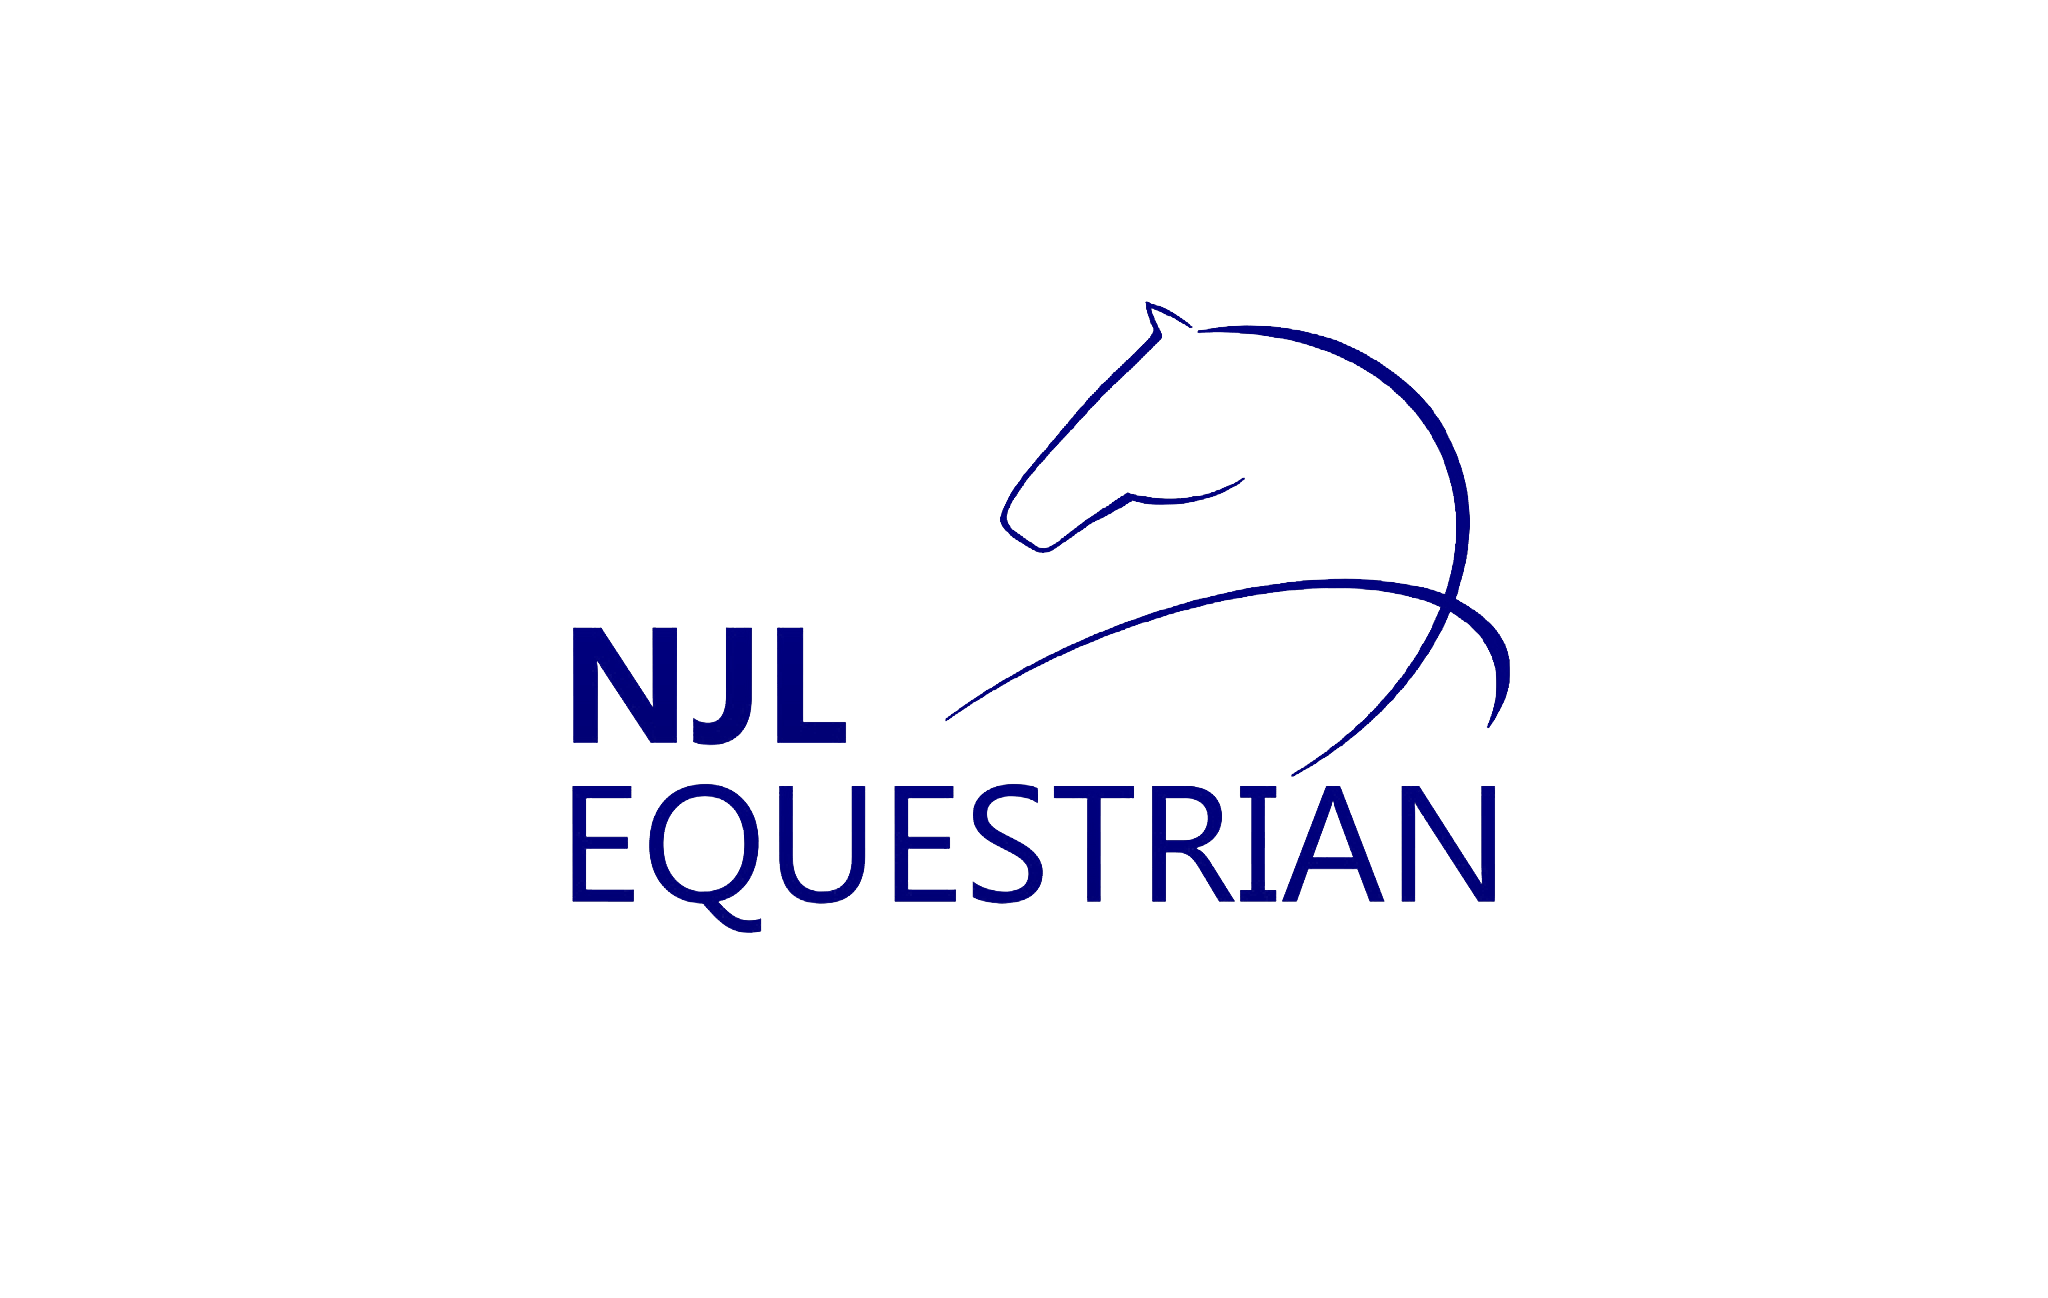 NJL Equestrian